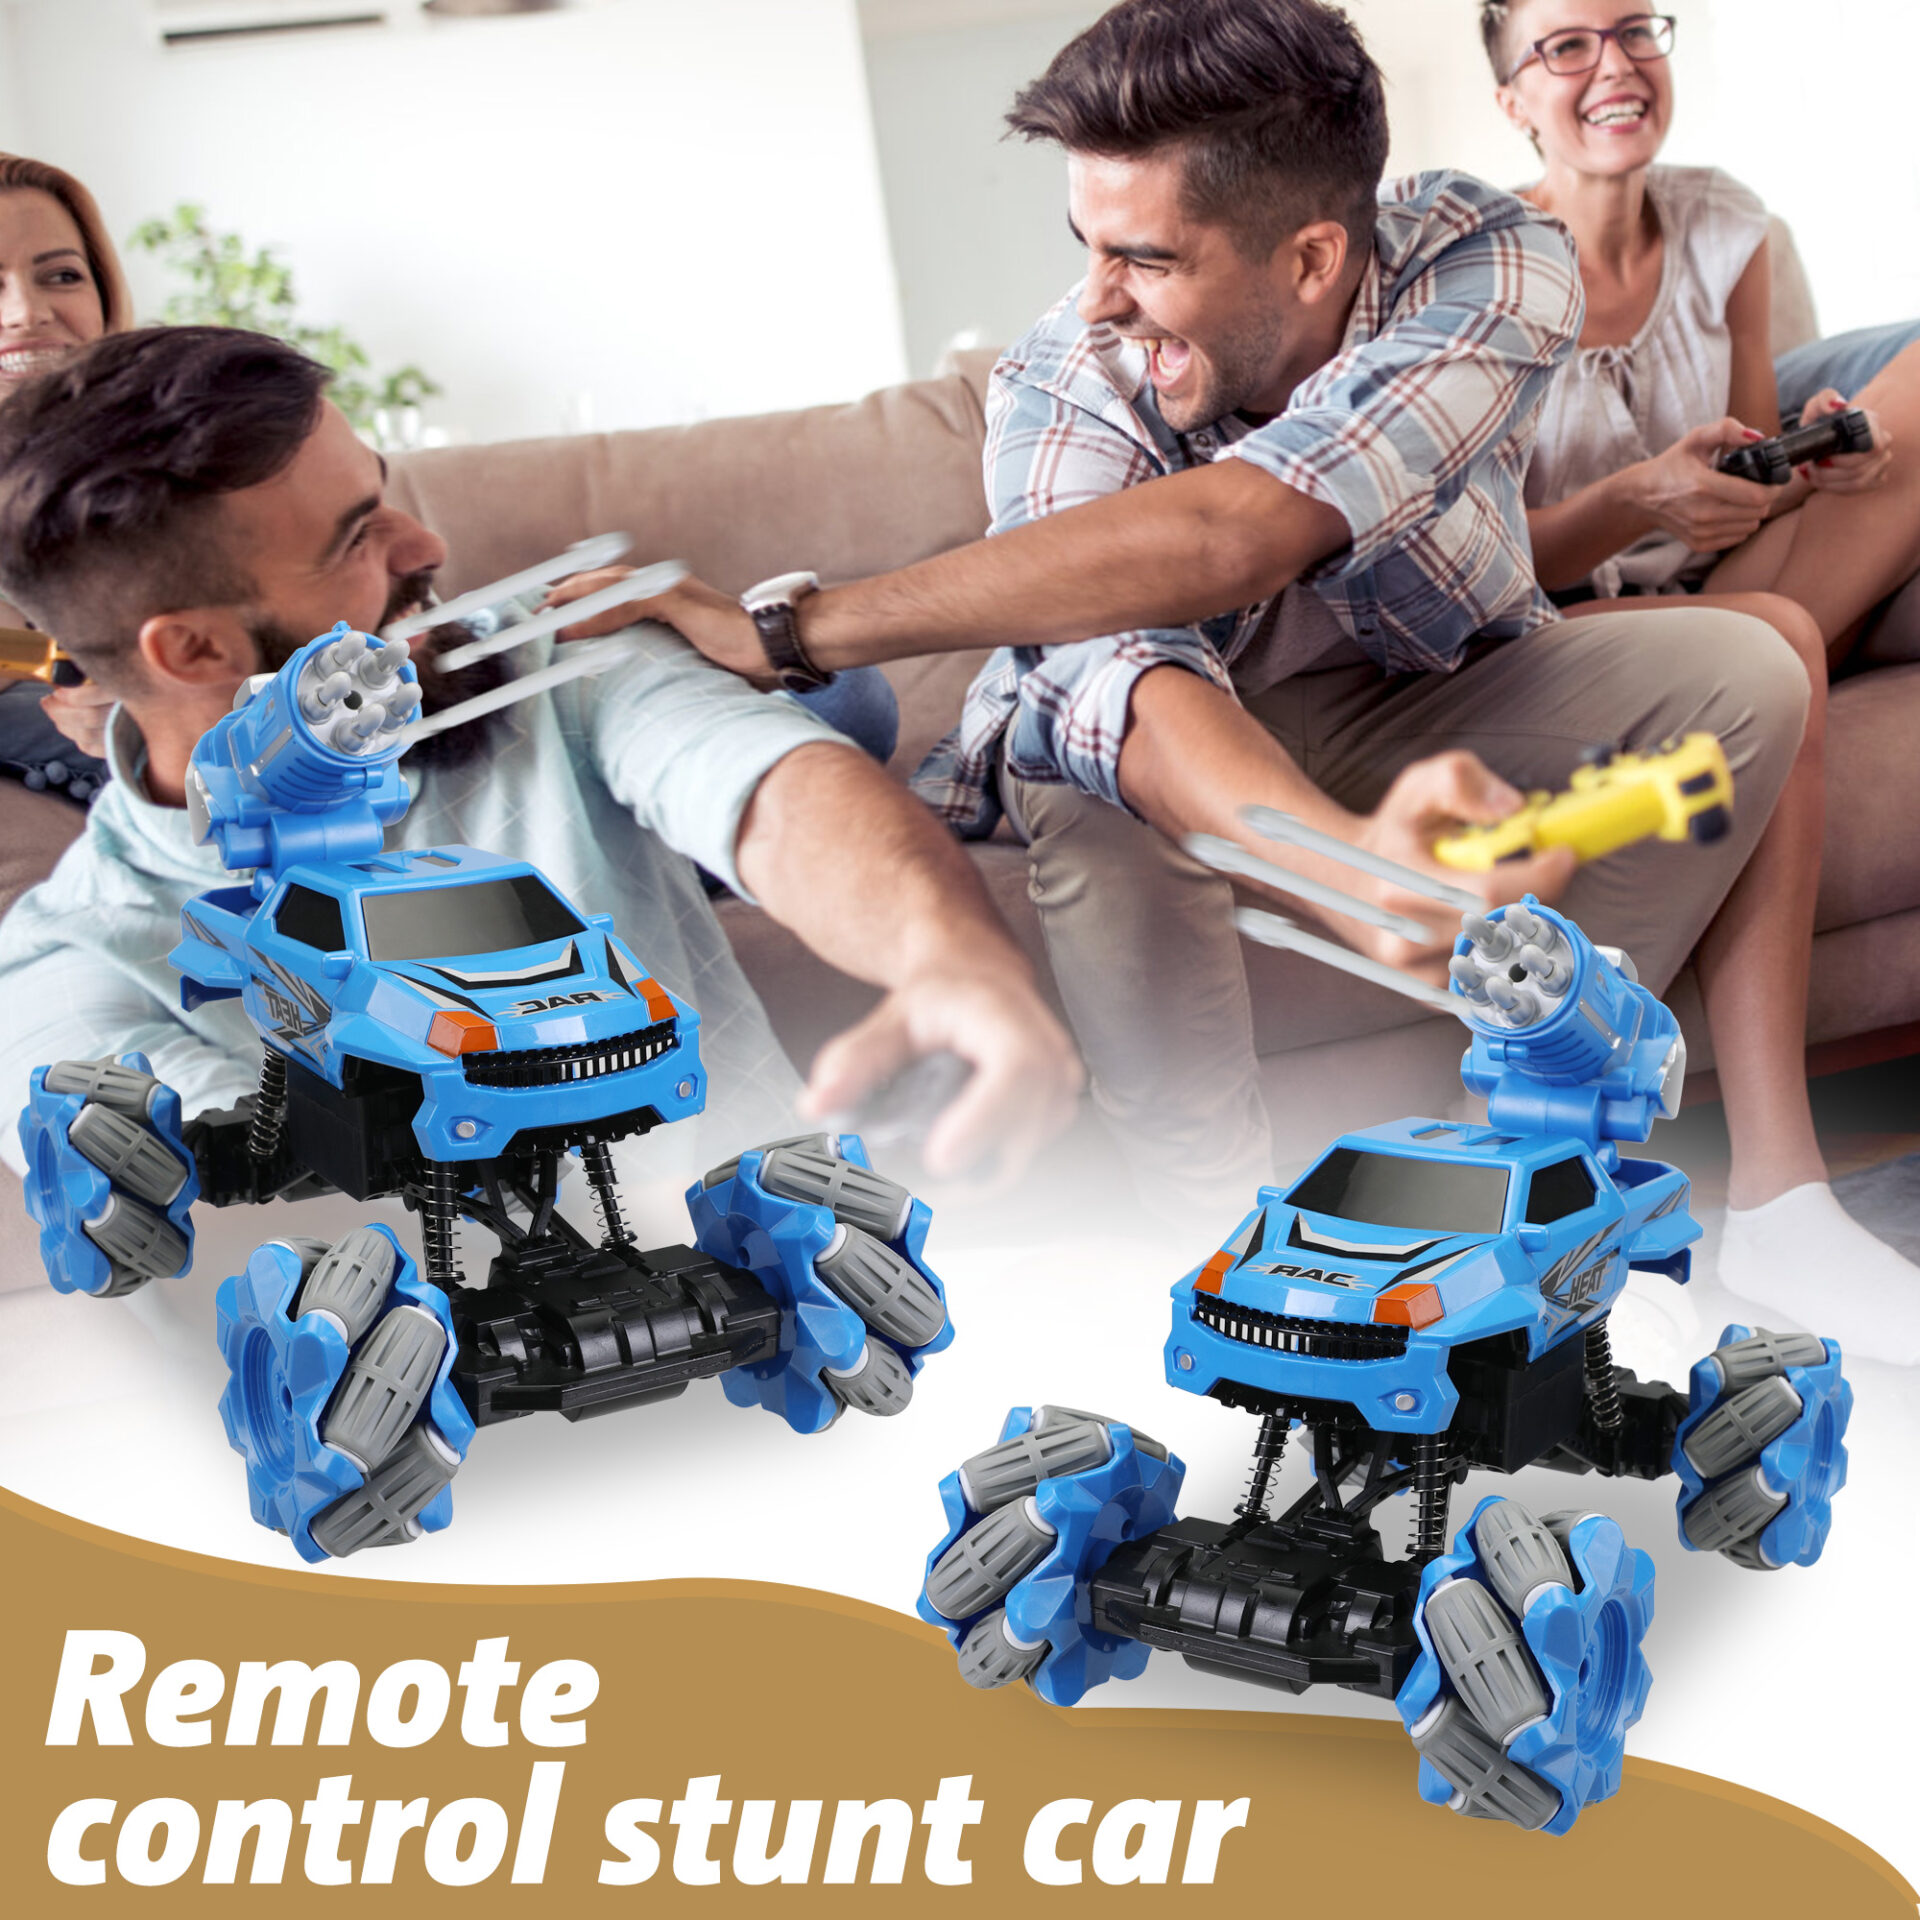 Gesture Sensing RC Stunt Car for Kids, Blue 2 6